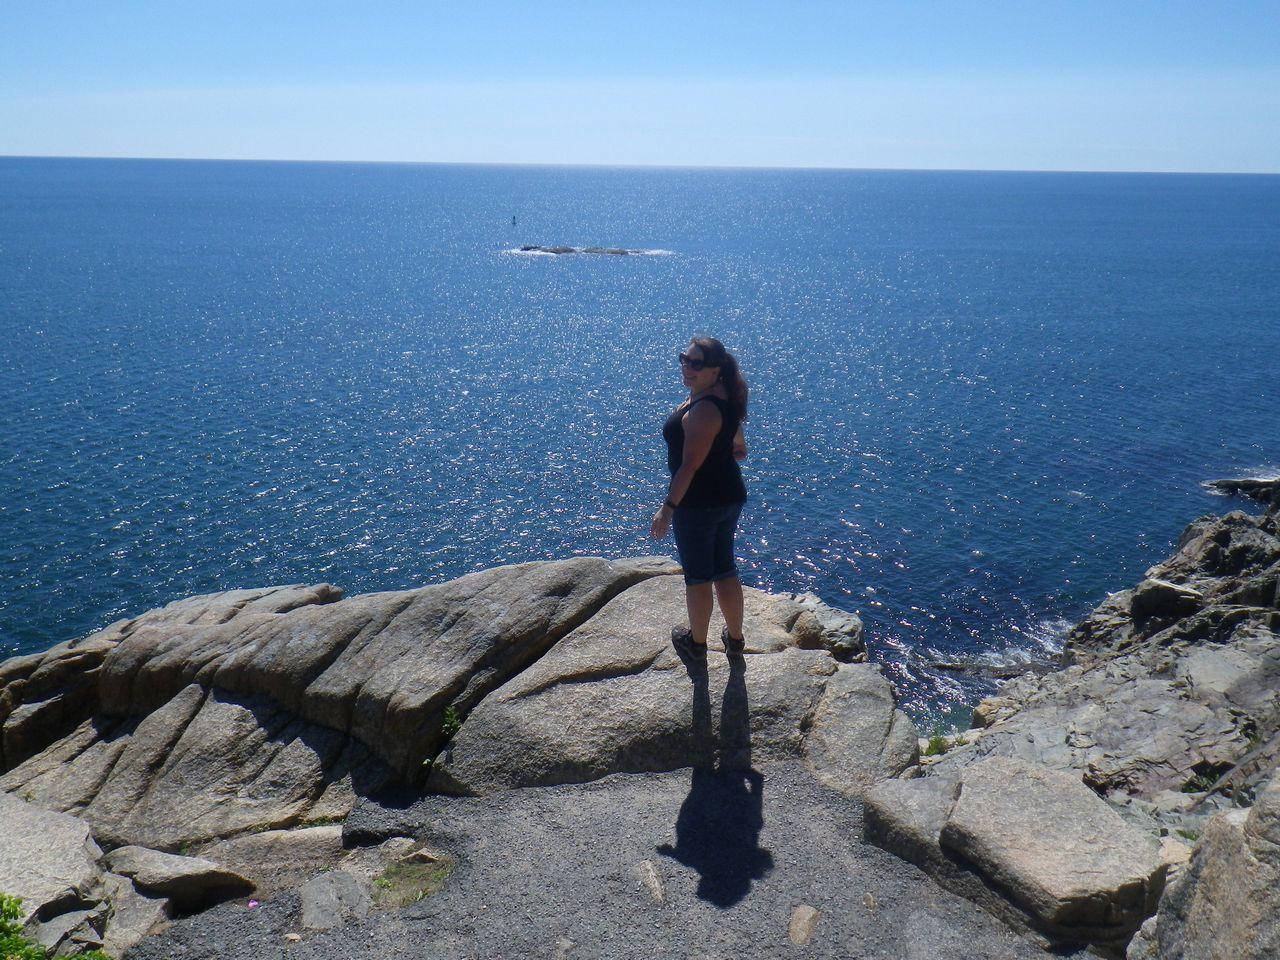 Me on cliffs of Park